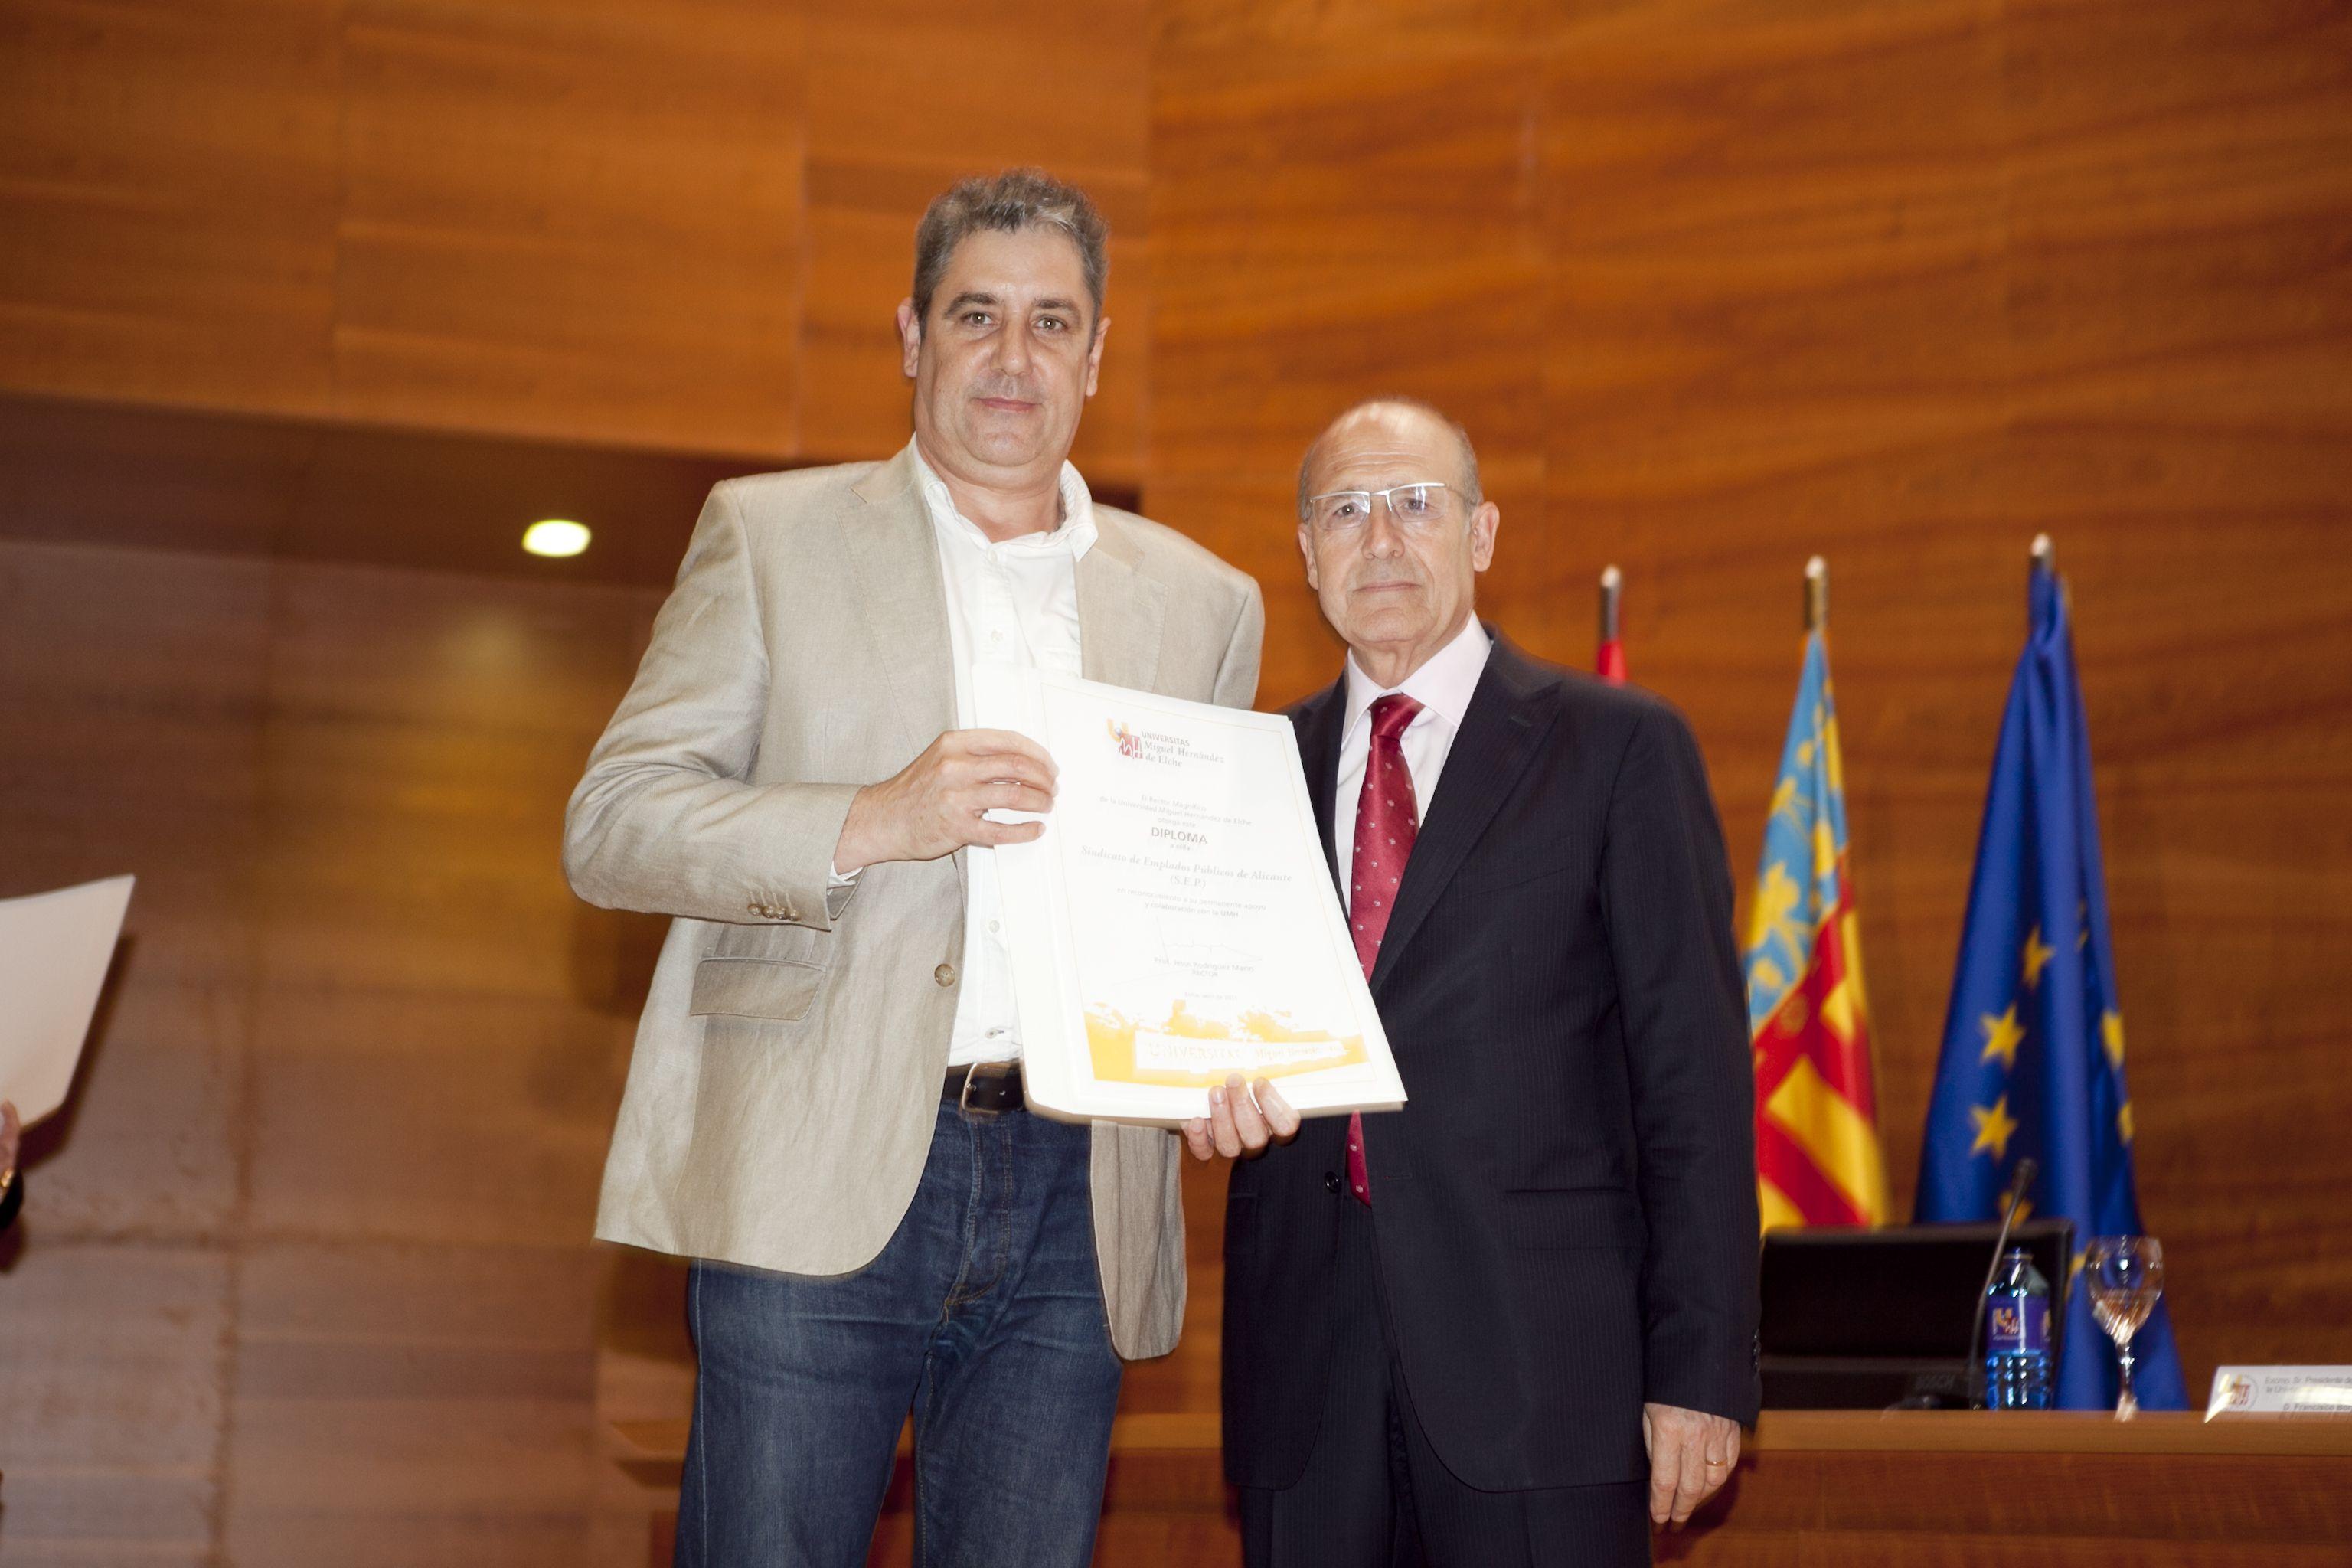 umh-diplomas-rector_mg_6939.jpg